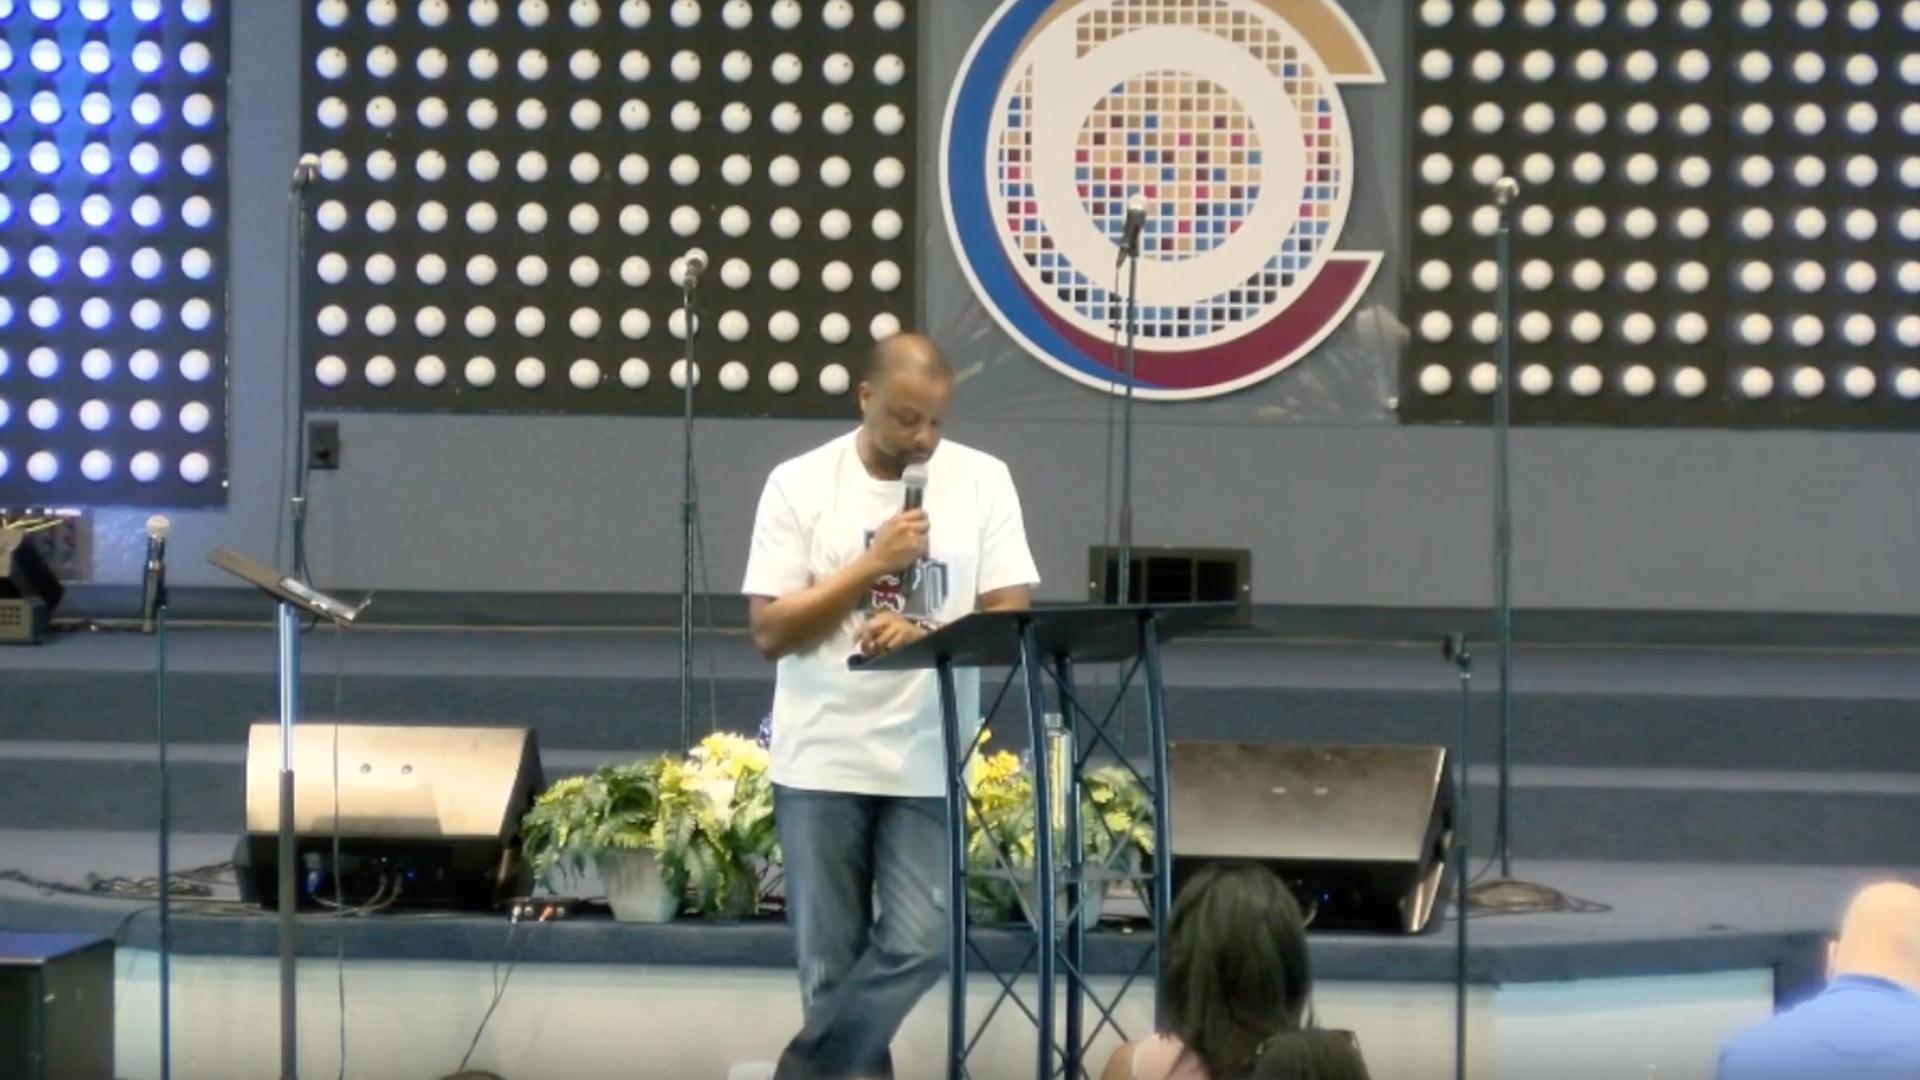 A Walk Through Ephesians - Pastor Darryl Scarbrough - June 9, 2019